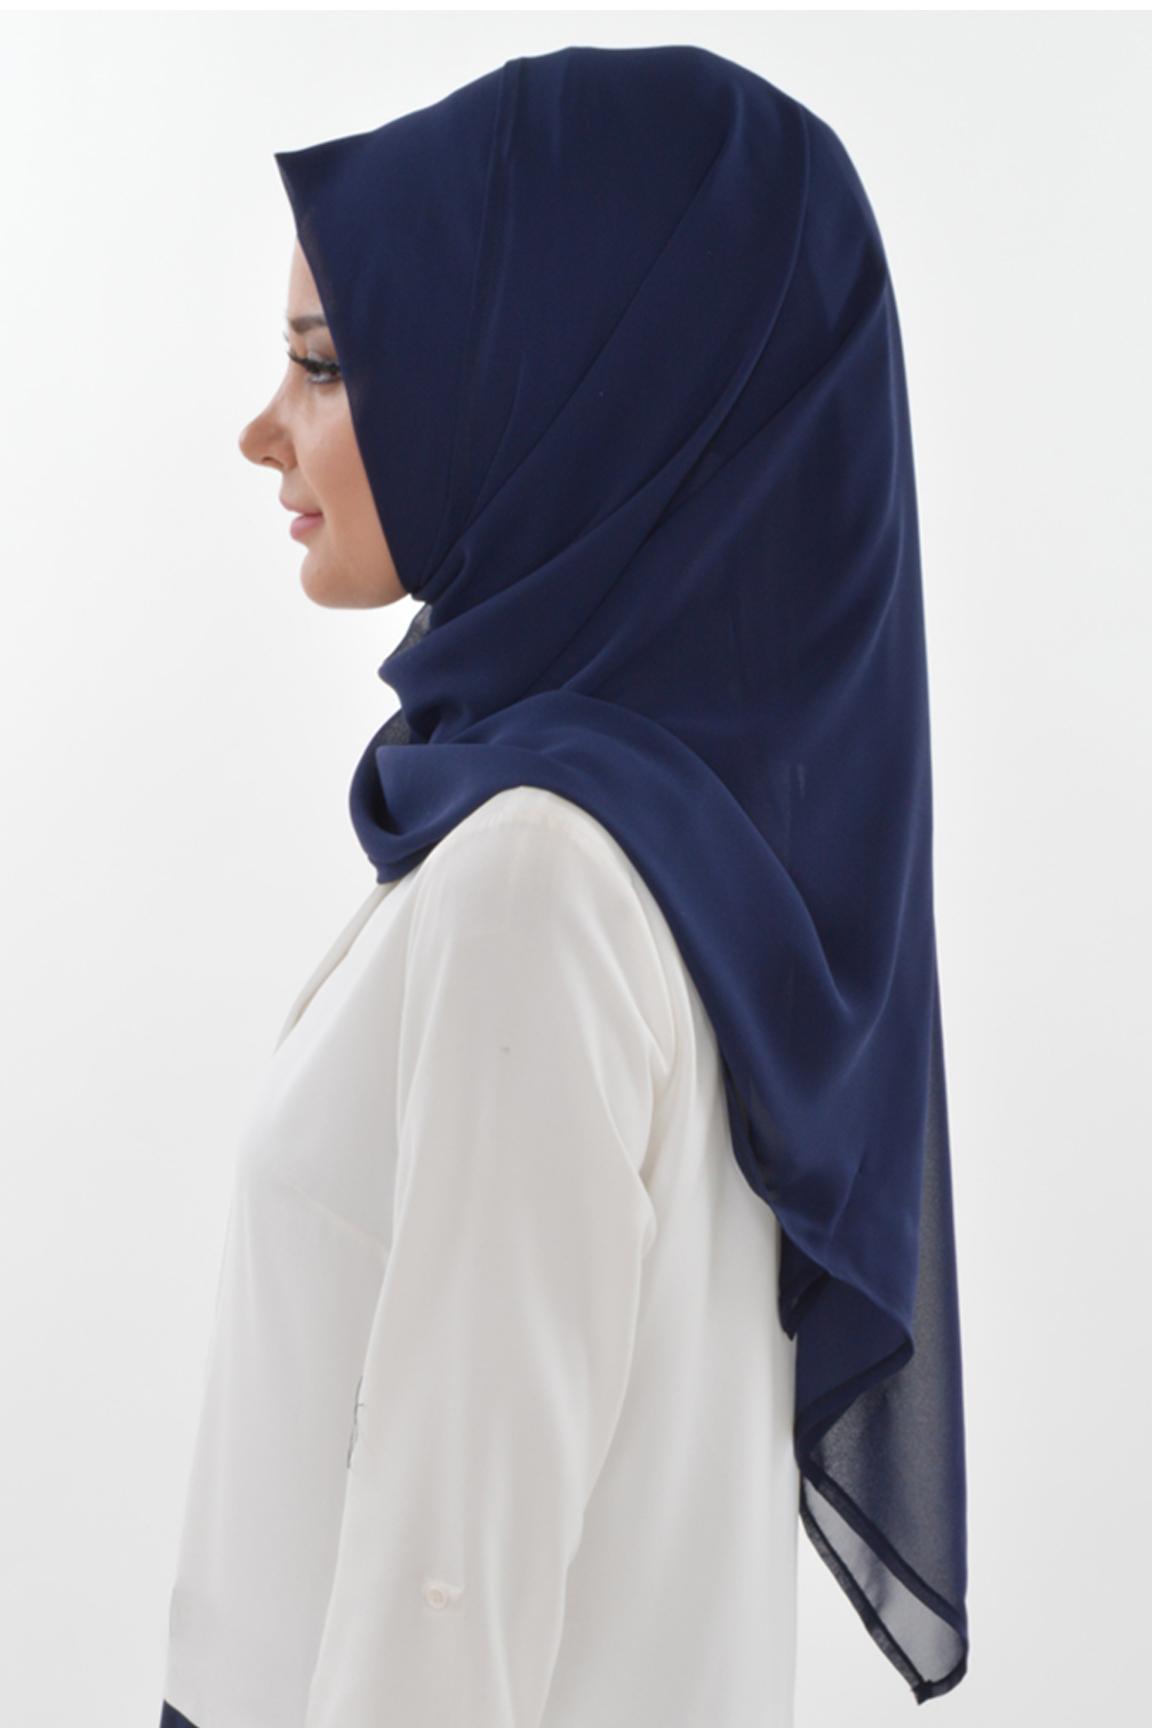 Islamic Easy Ready Muslim Hijab Practical Instant Chiffon Turkish Hijab Shawl